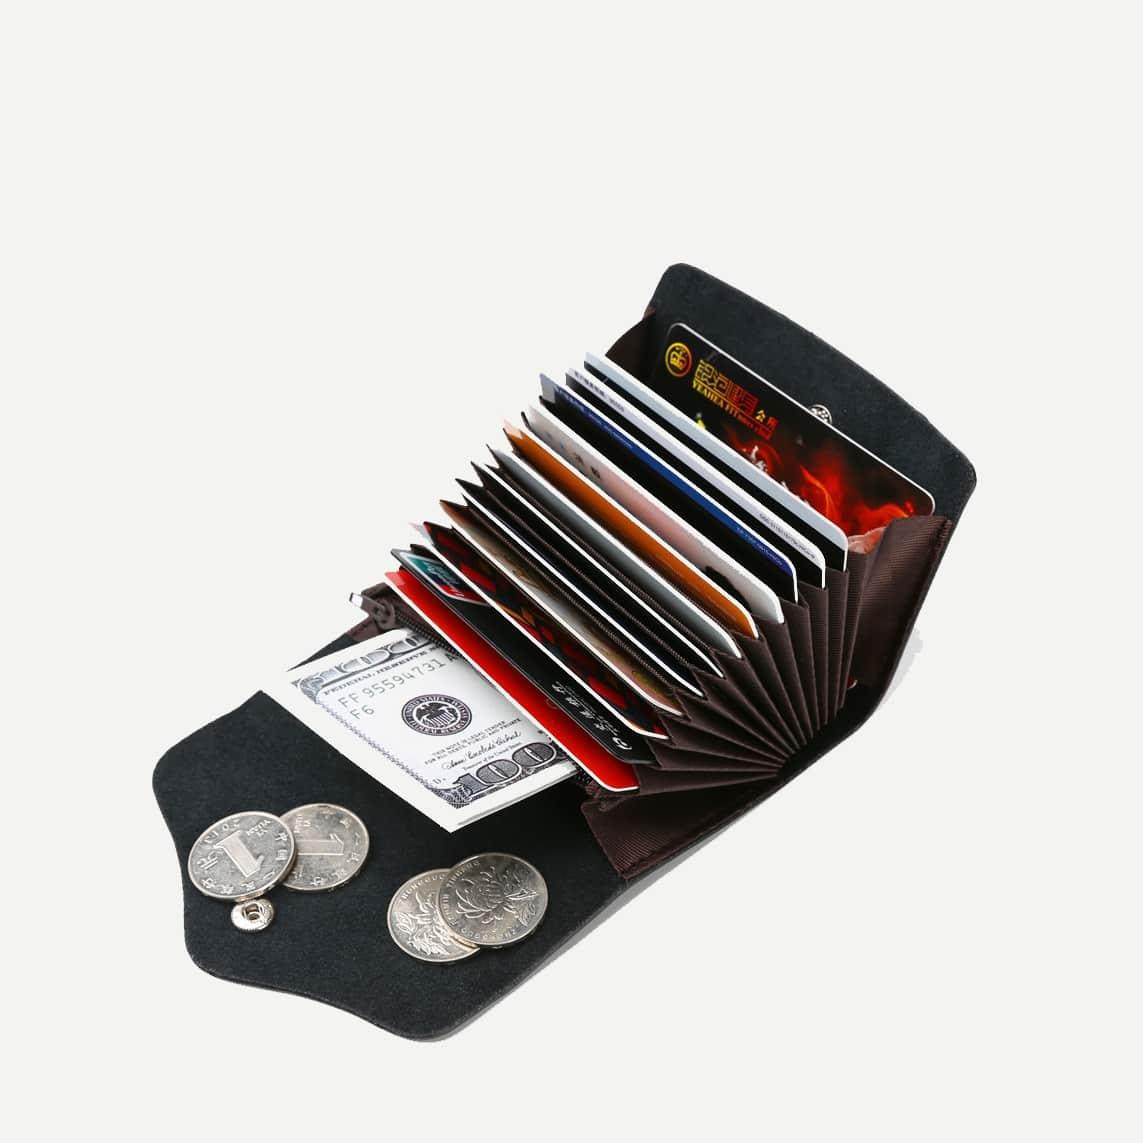 Umgeschlagener Kartenhalter